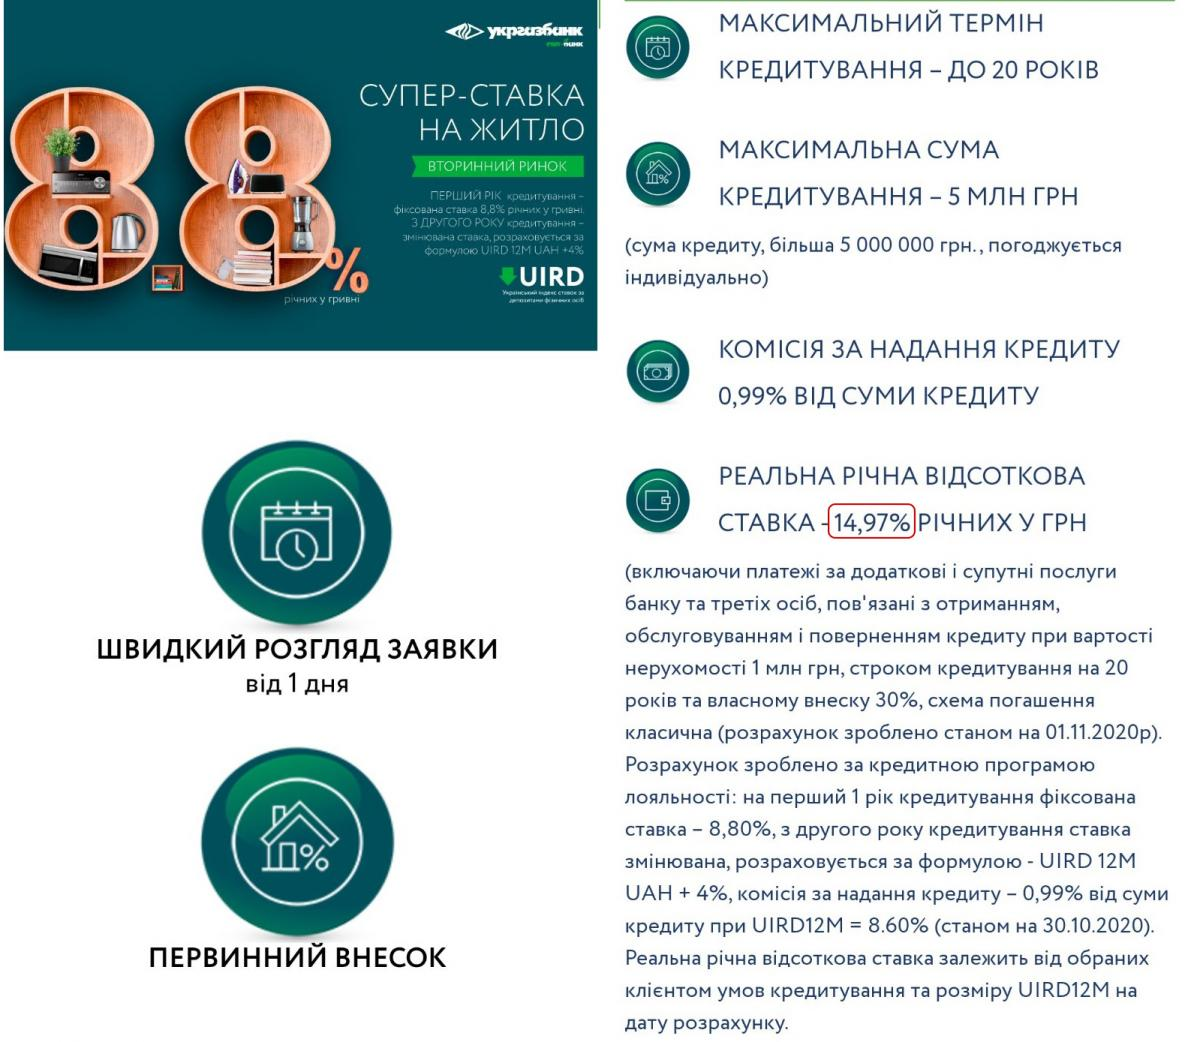 ukrgazbank.jpg